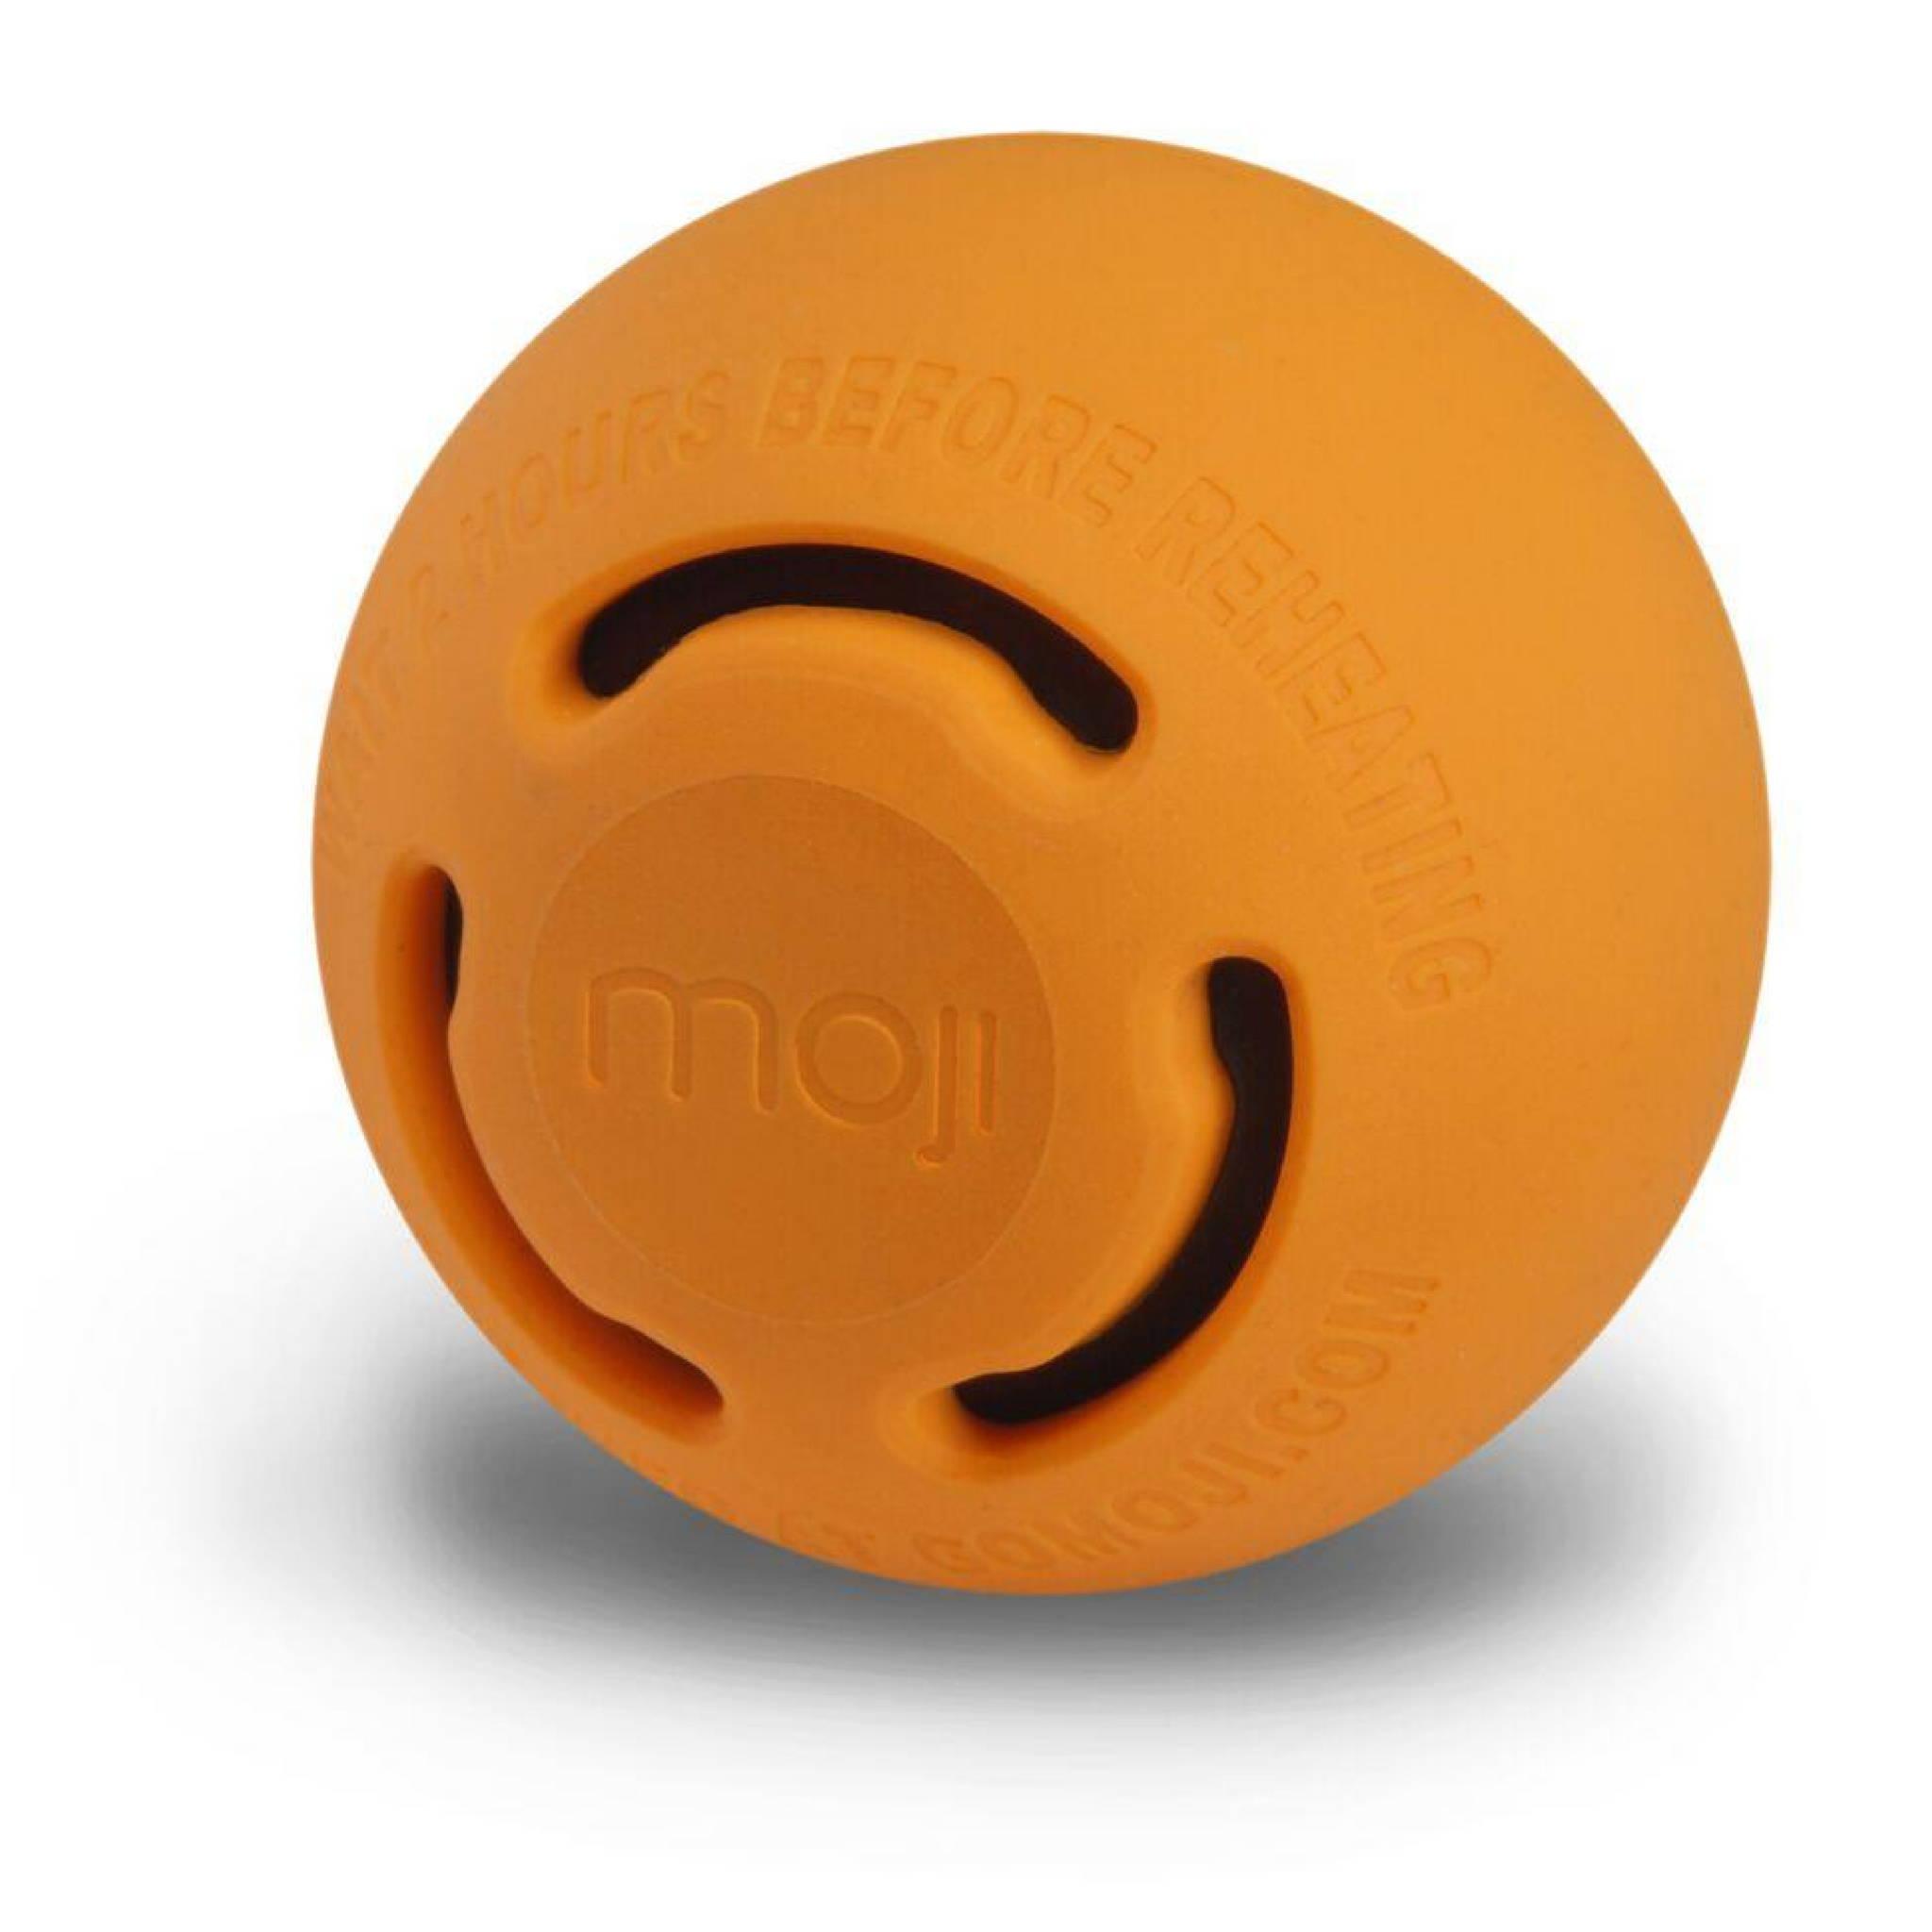 Moji heated ball close up